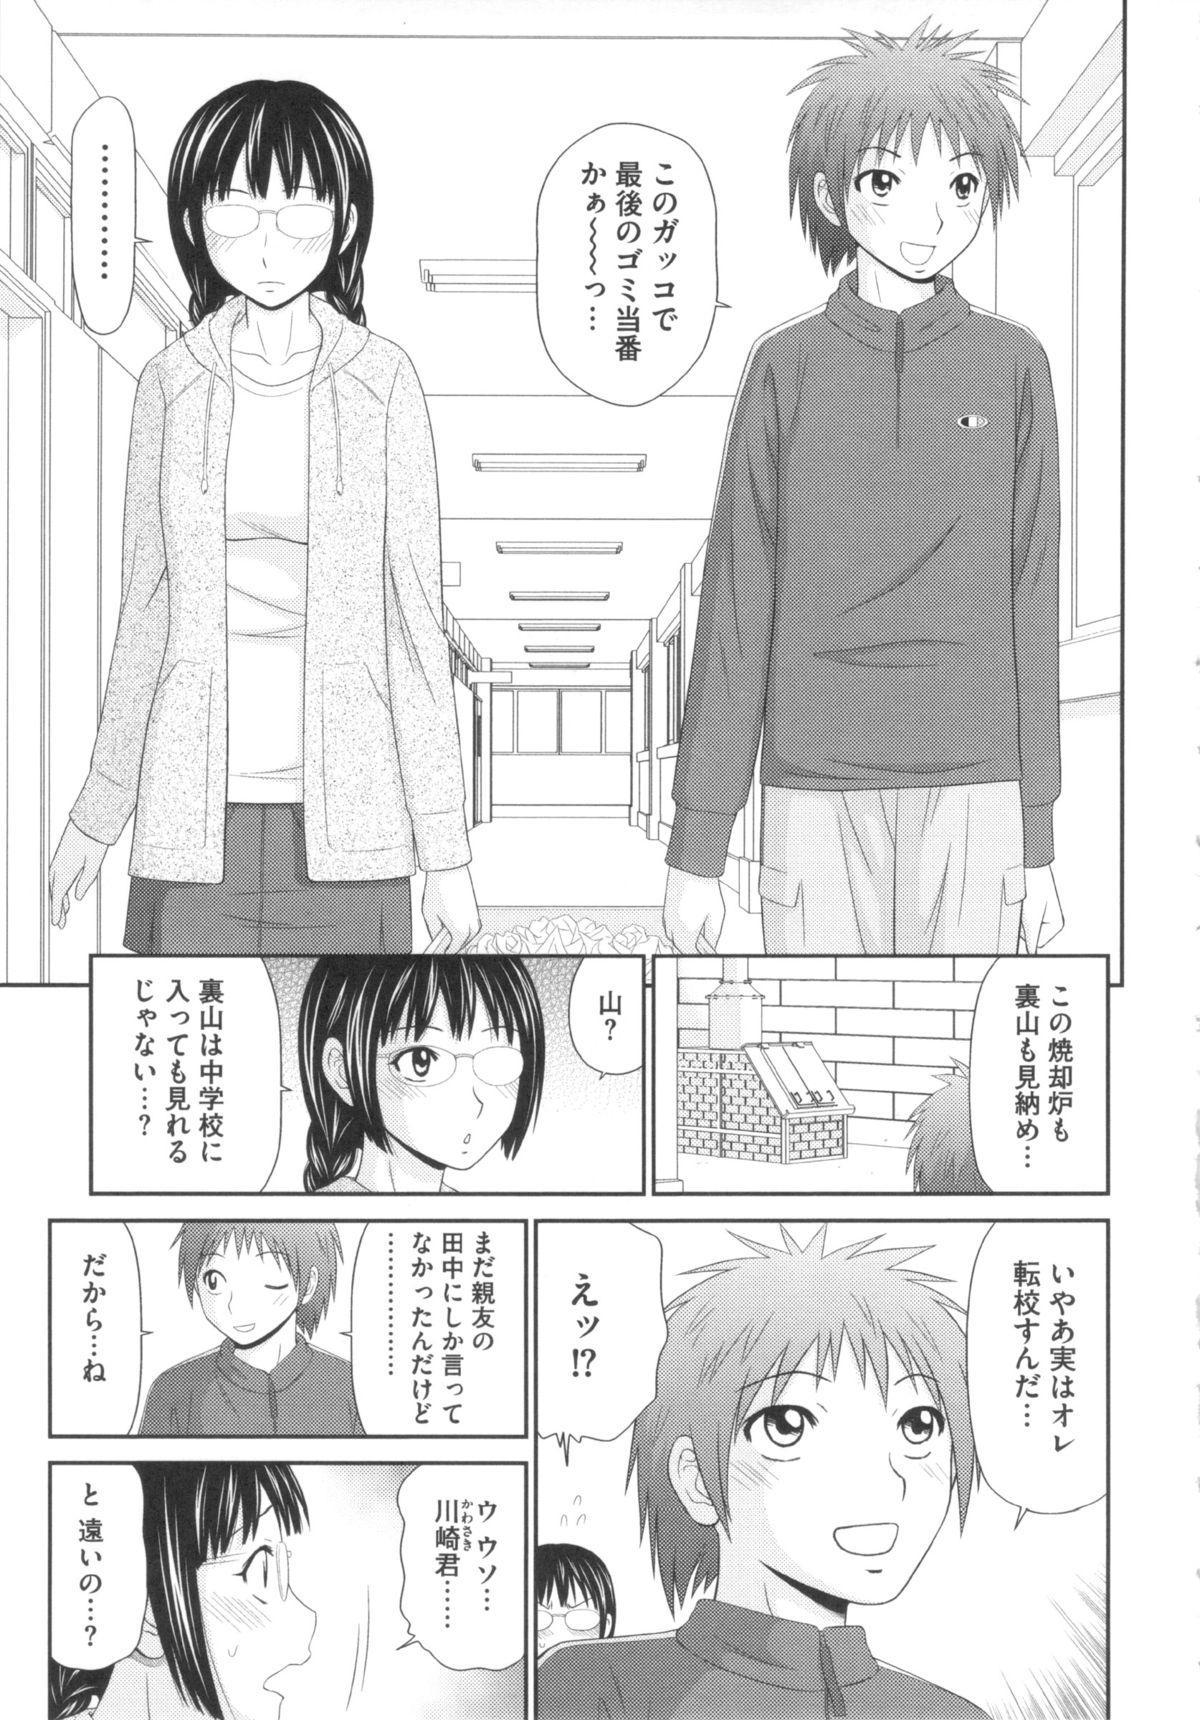 Kiseki No Zaajiru - Sperm of Miracle 167